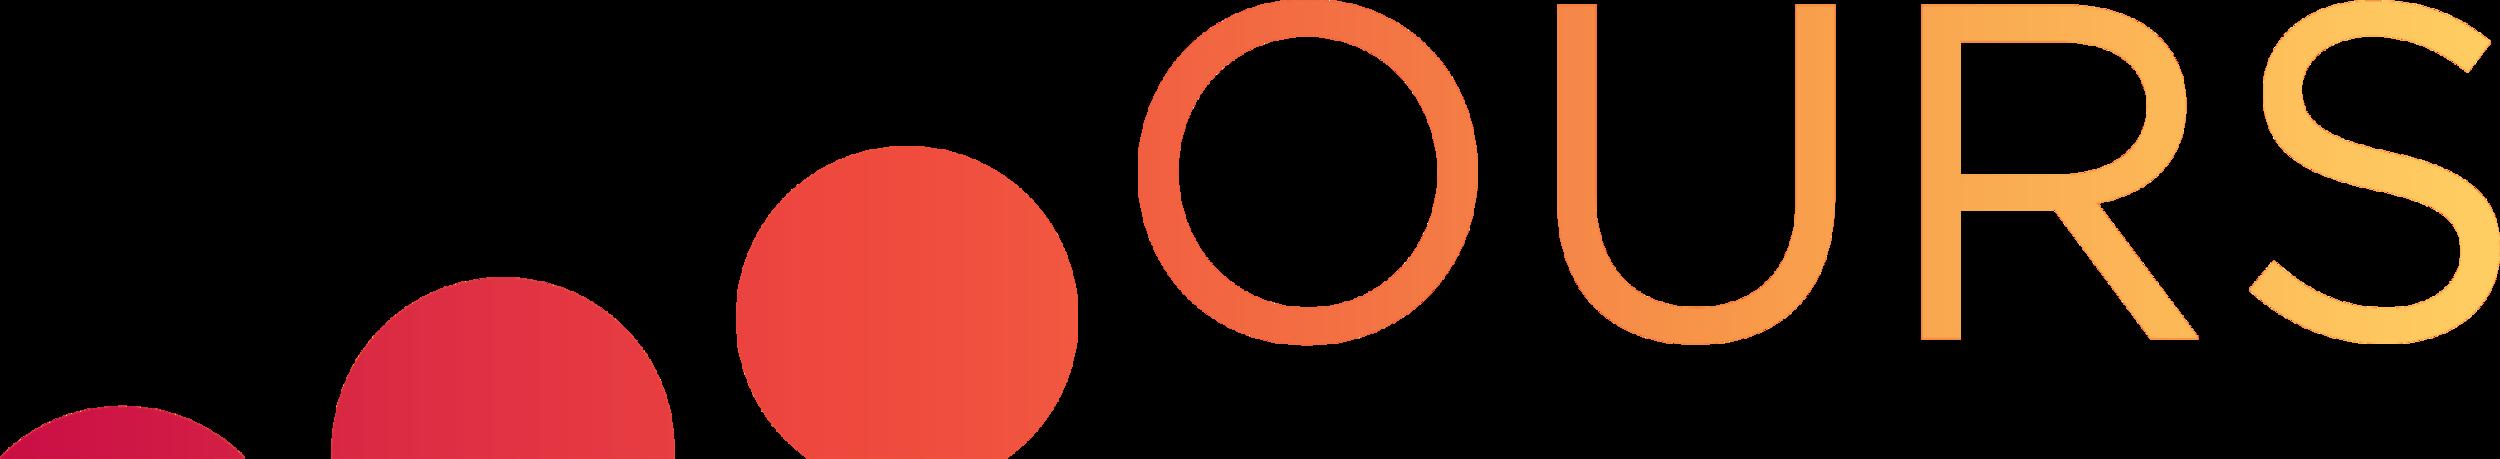 Finalized Logo encompassing the sun's positivity.